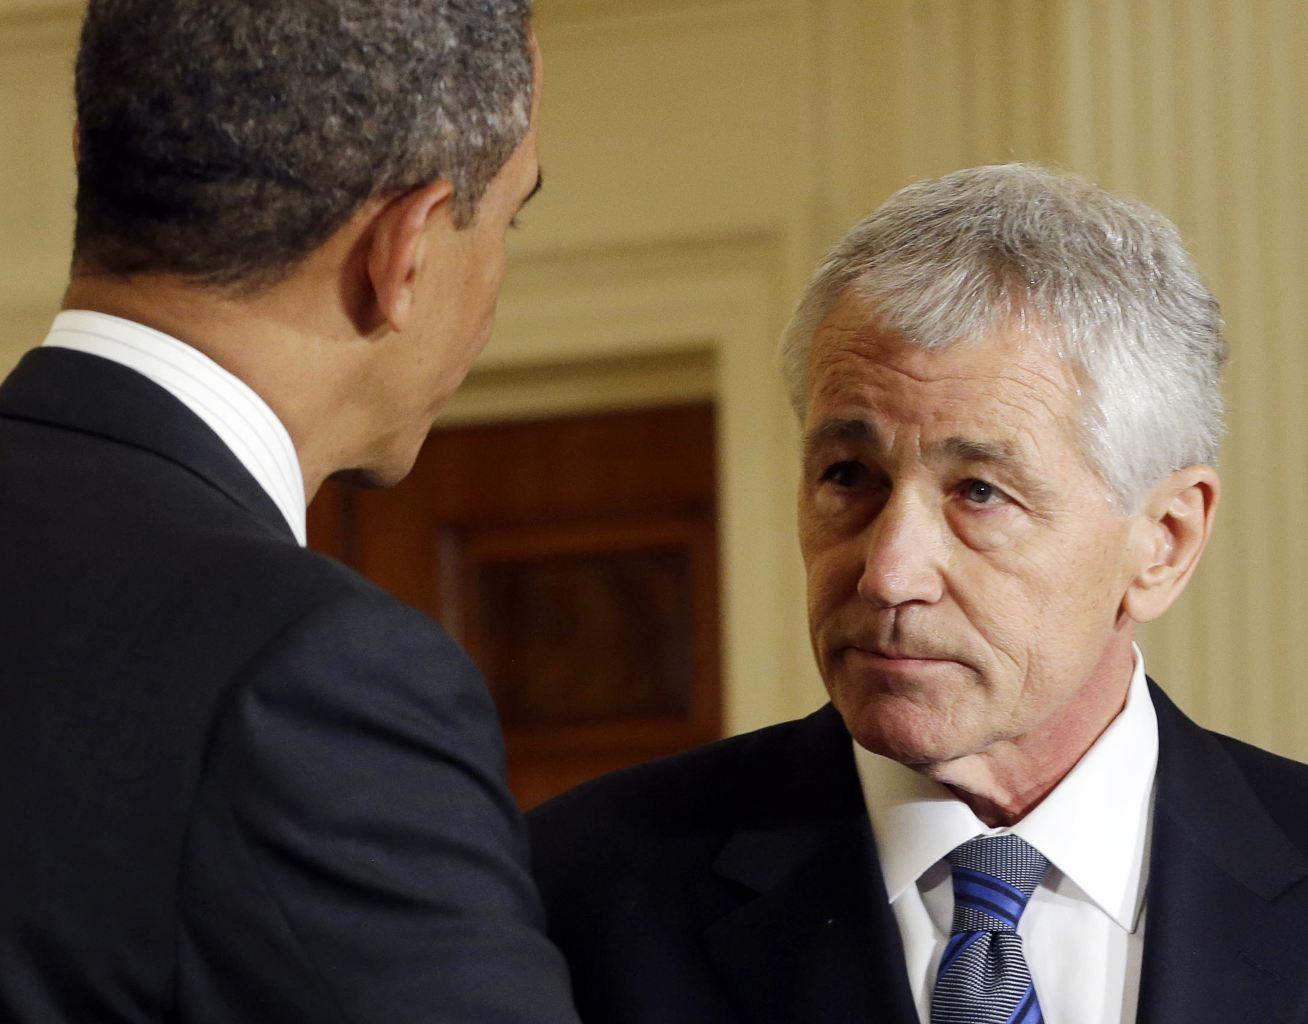 Chuck Hagel with President Obama (AP Photo/Carolyn Kaster, File)